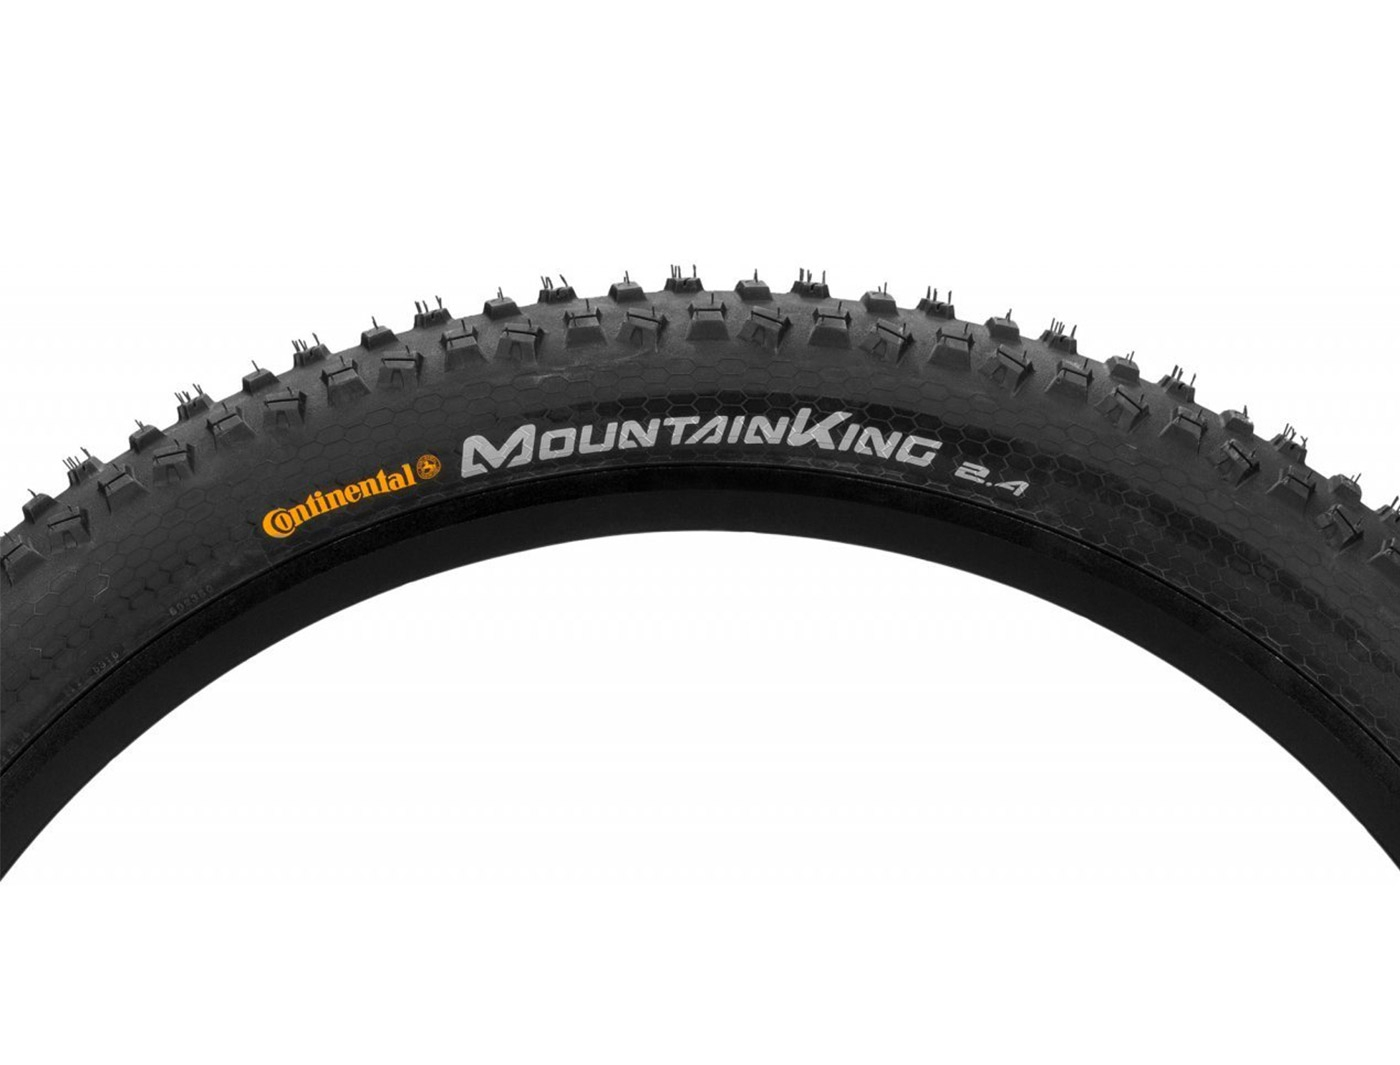 "Покрышка 27.5x2.4"" Continental Mountain King RaceSport foldable OEM 3/180Tpi 785гр. (01995170007)"